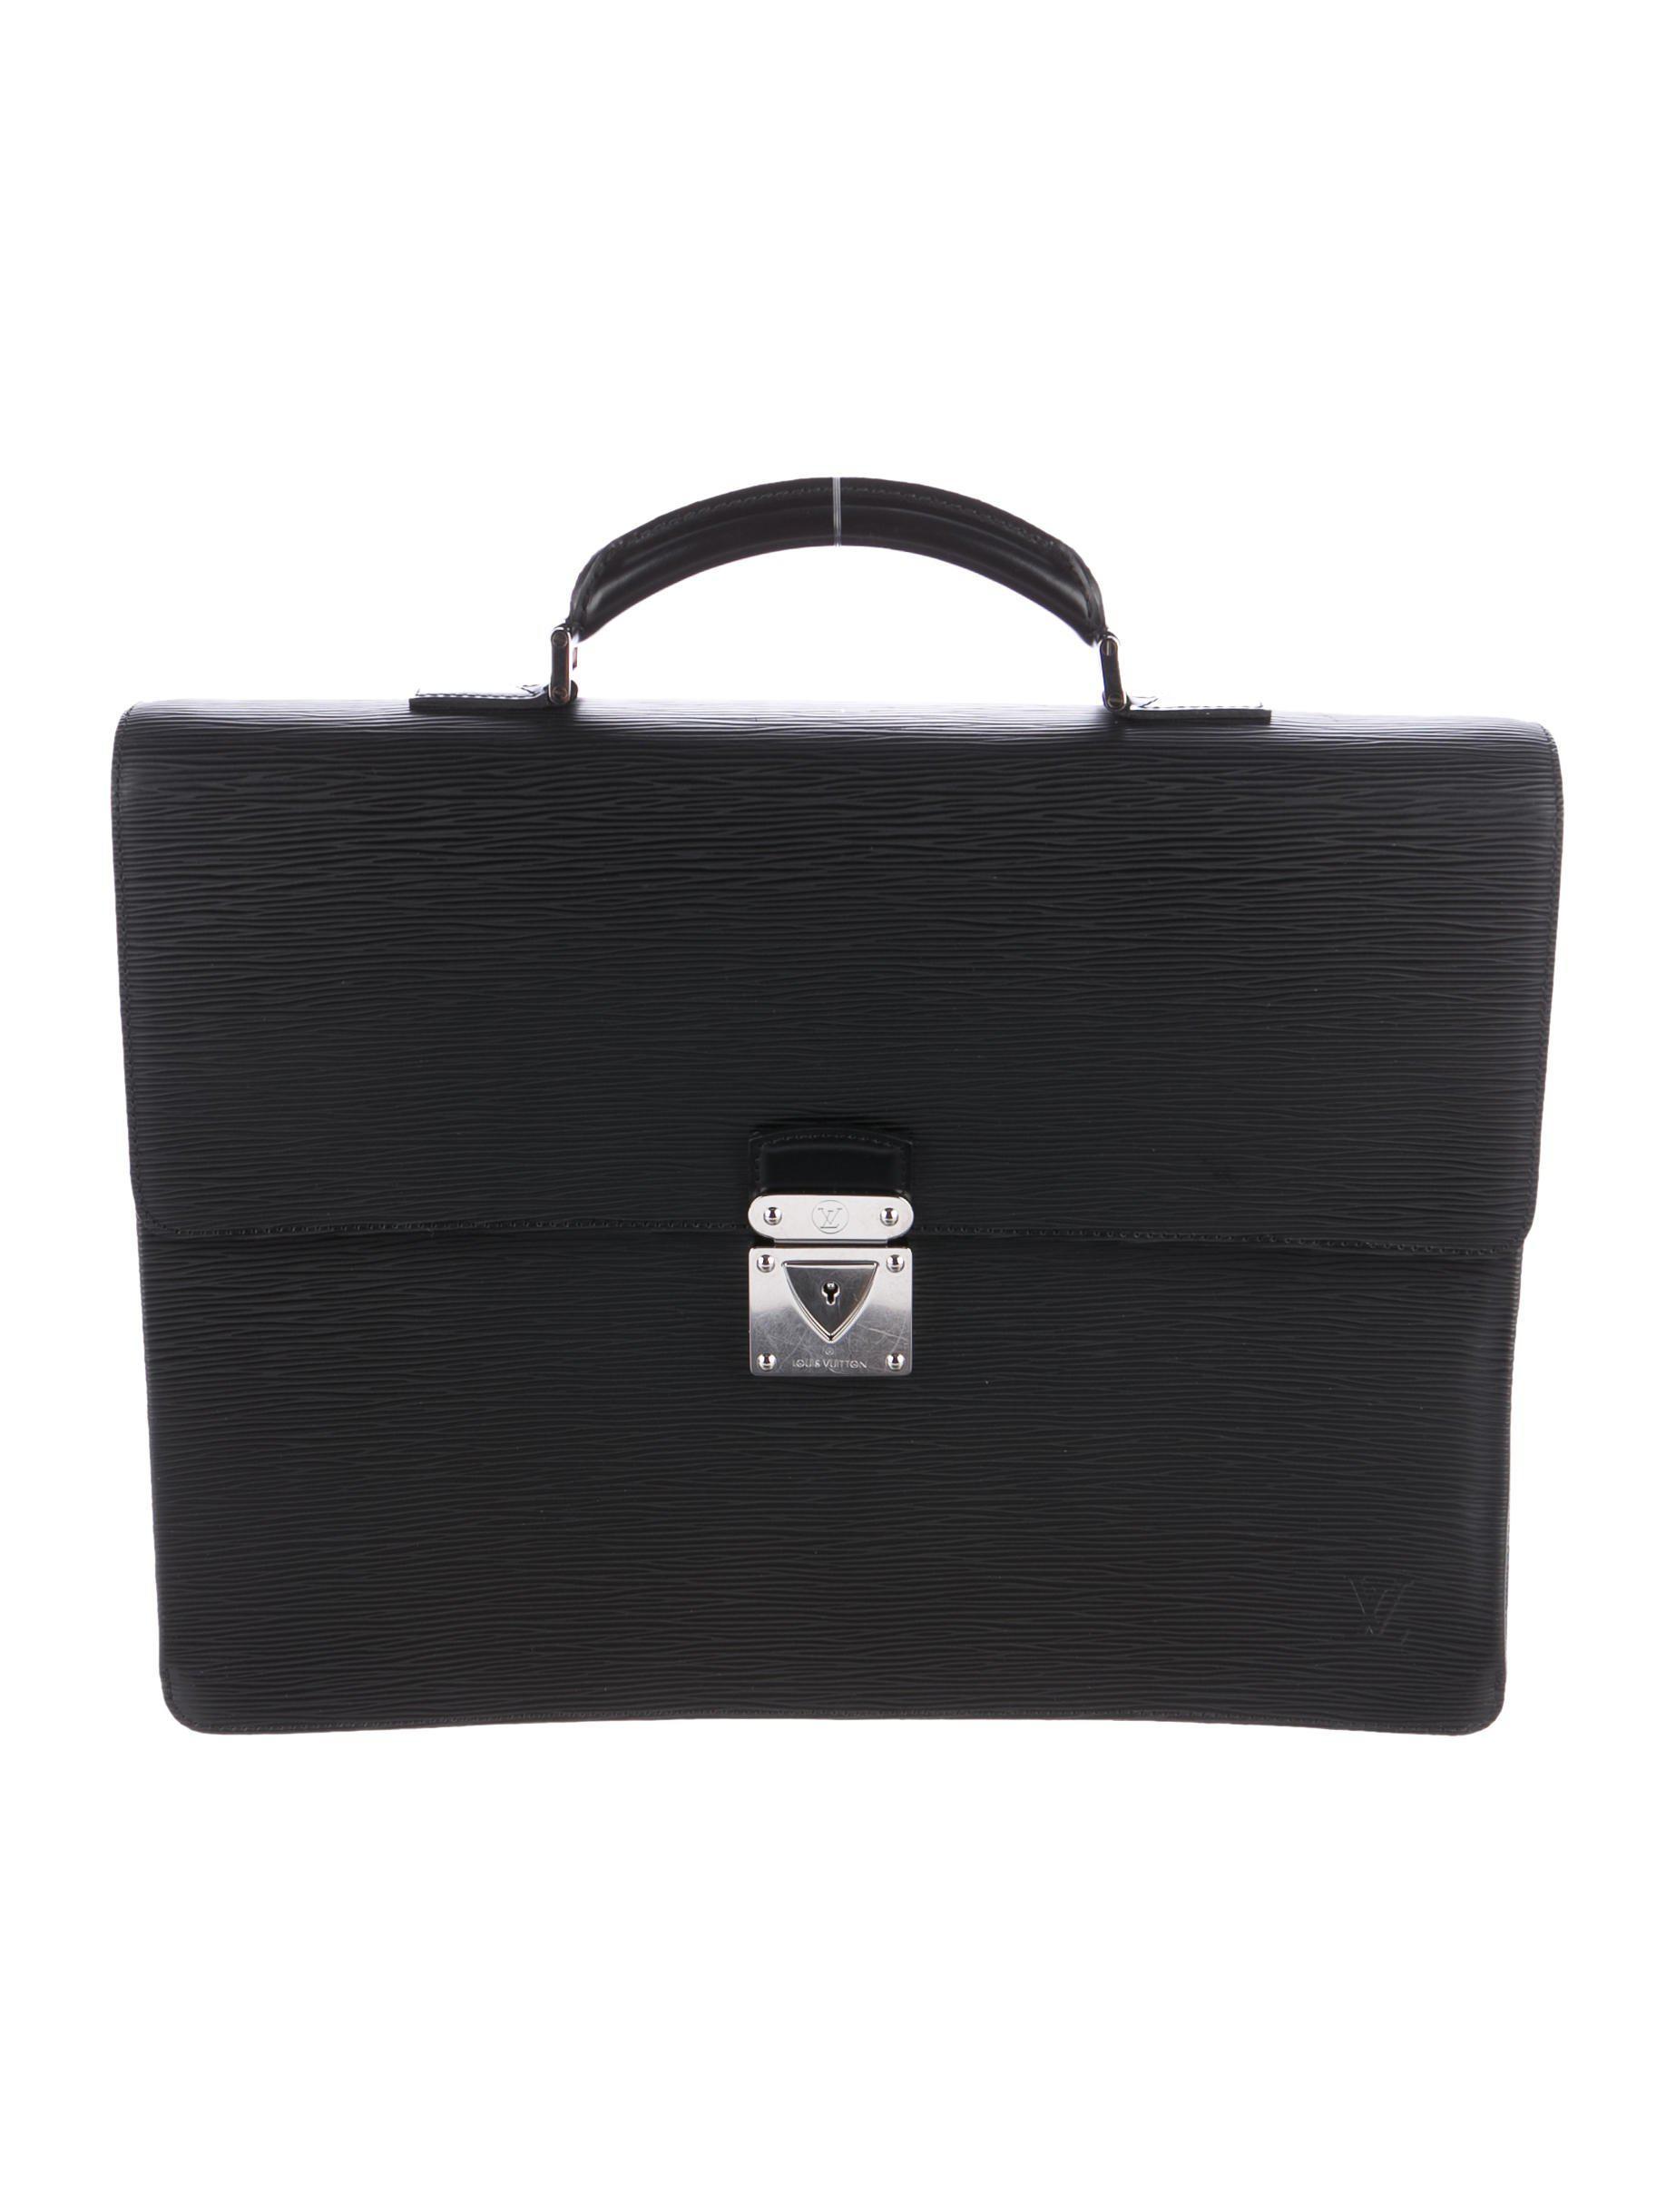 Louis Vuitton. Metallic Epi Robusto 2 Compartment Briefcase Black